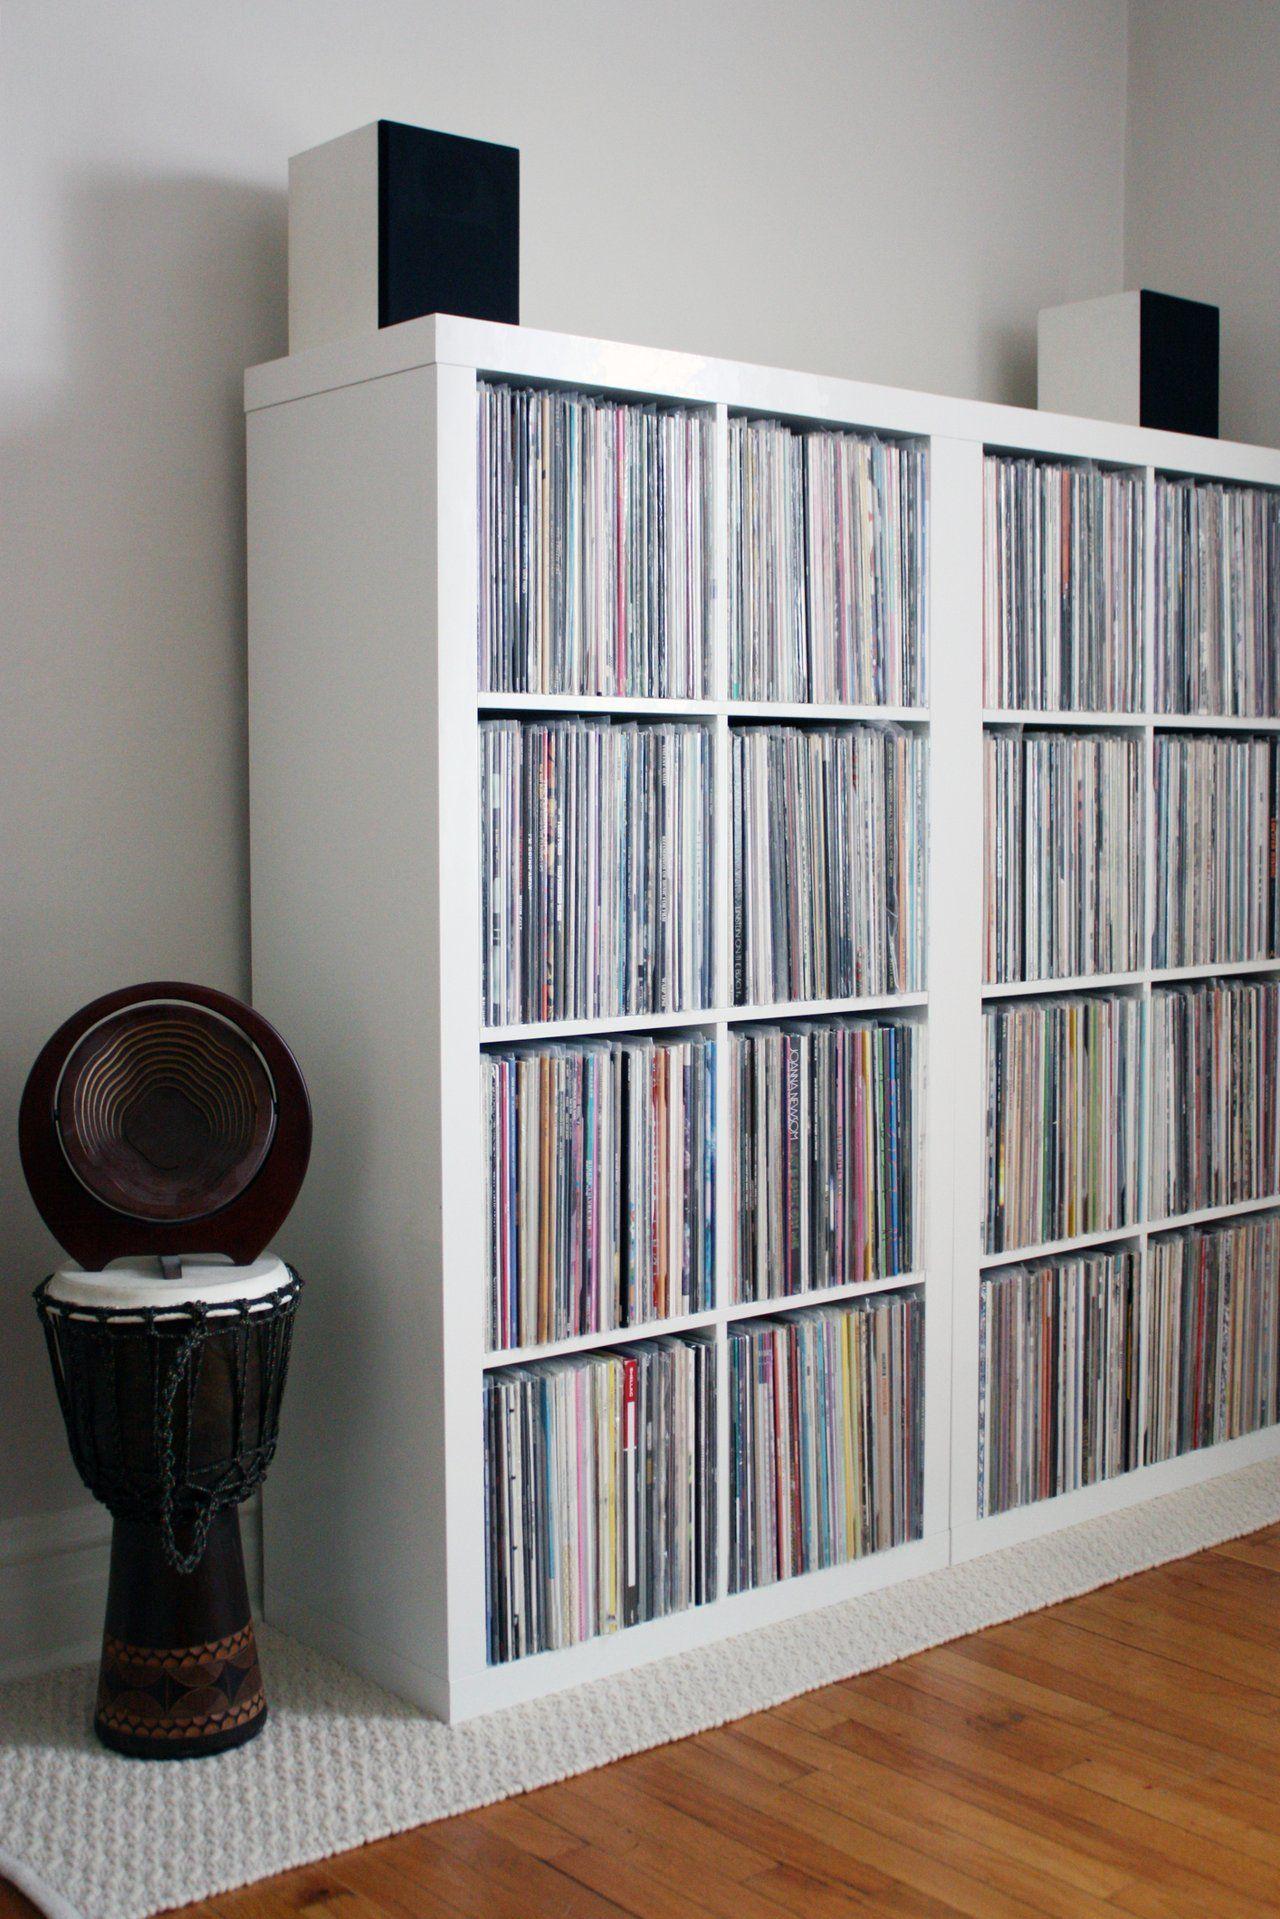 Image Result For Magazine Collection Storage Ideas Ikea Record Storage Home Studio Music Record Storage